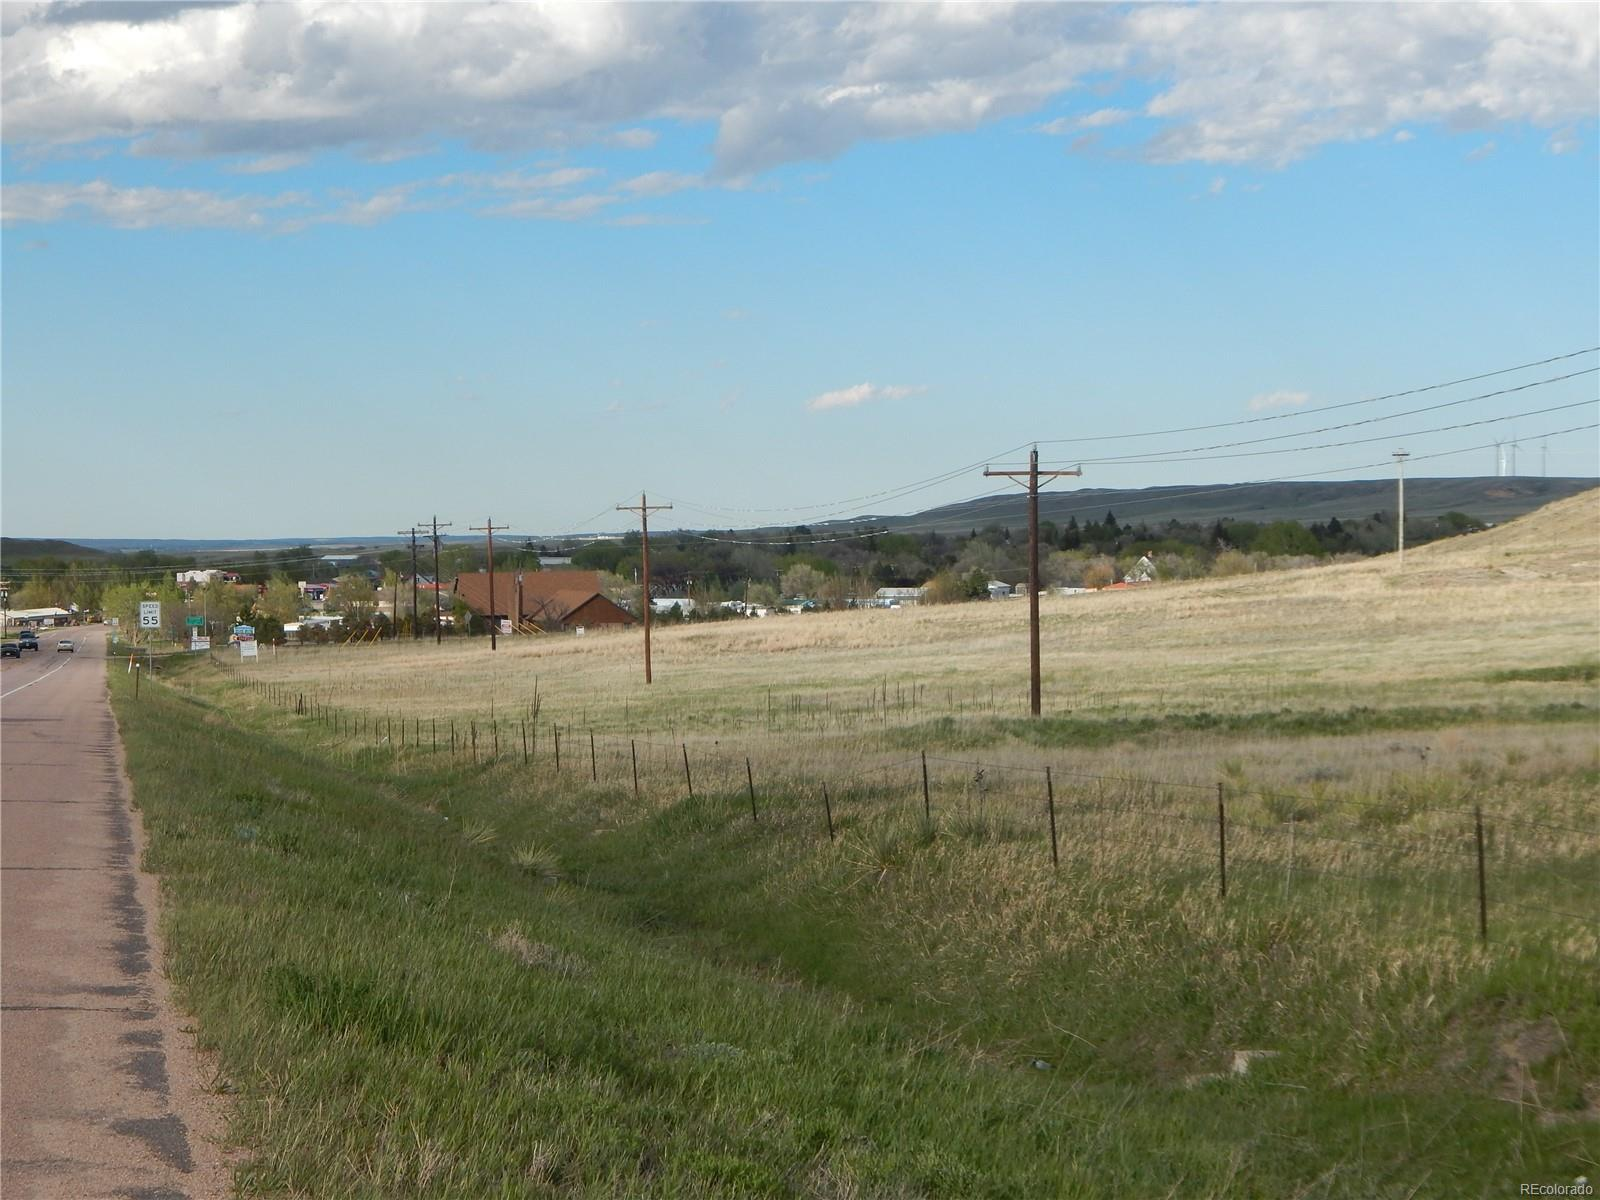 000 Highway 24, Calhan, CO 80808 - Calhan, CO real estate listing